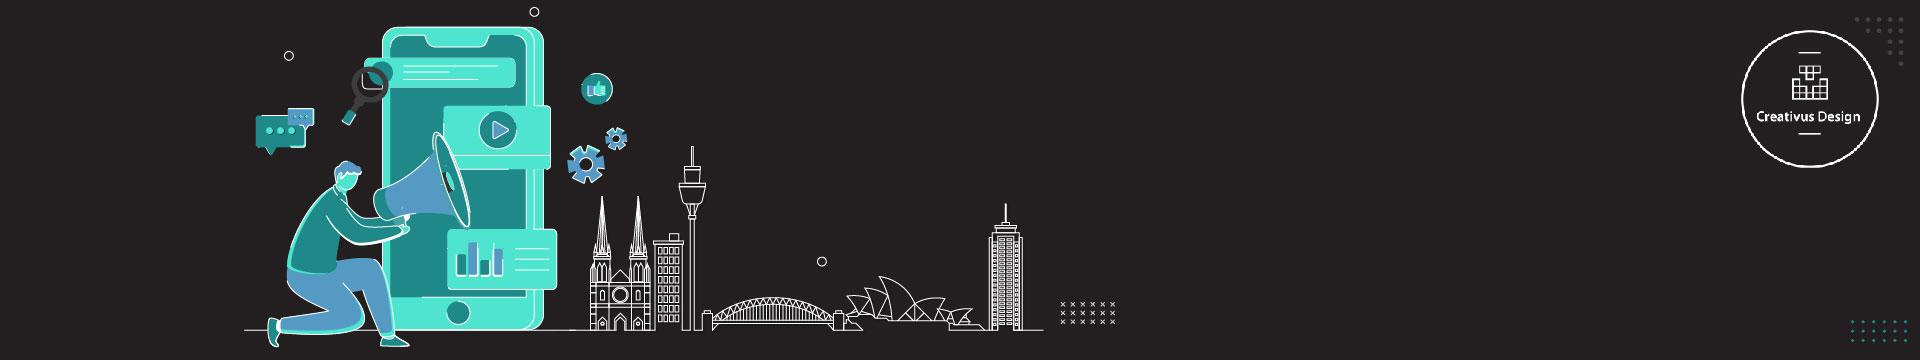 hire a digital marketing agency in australia